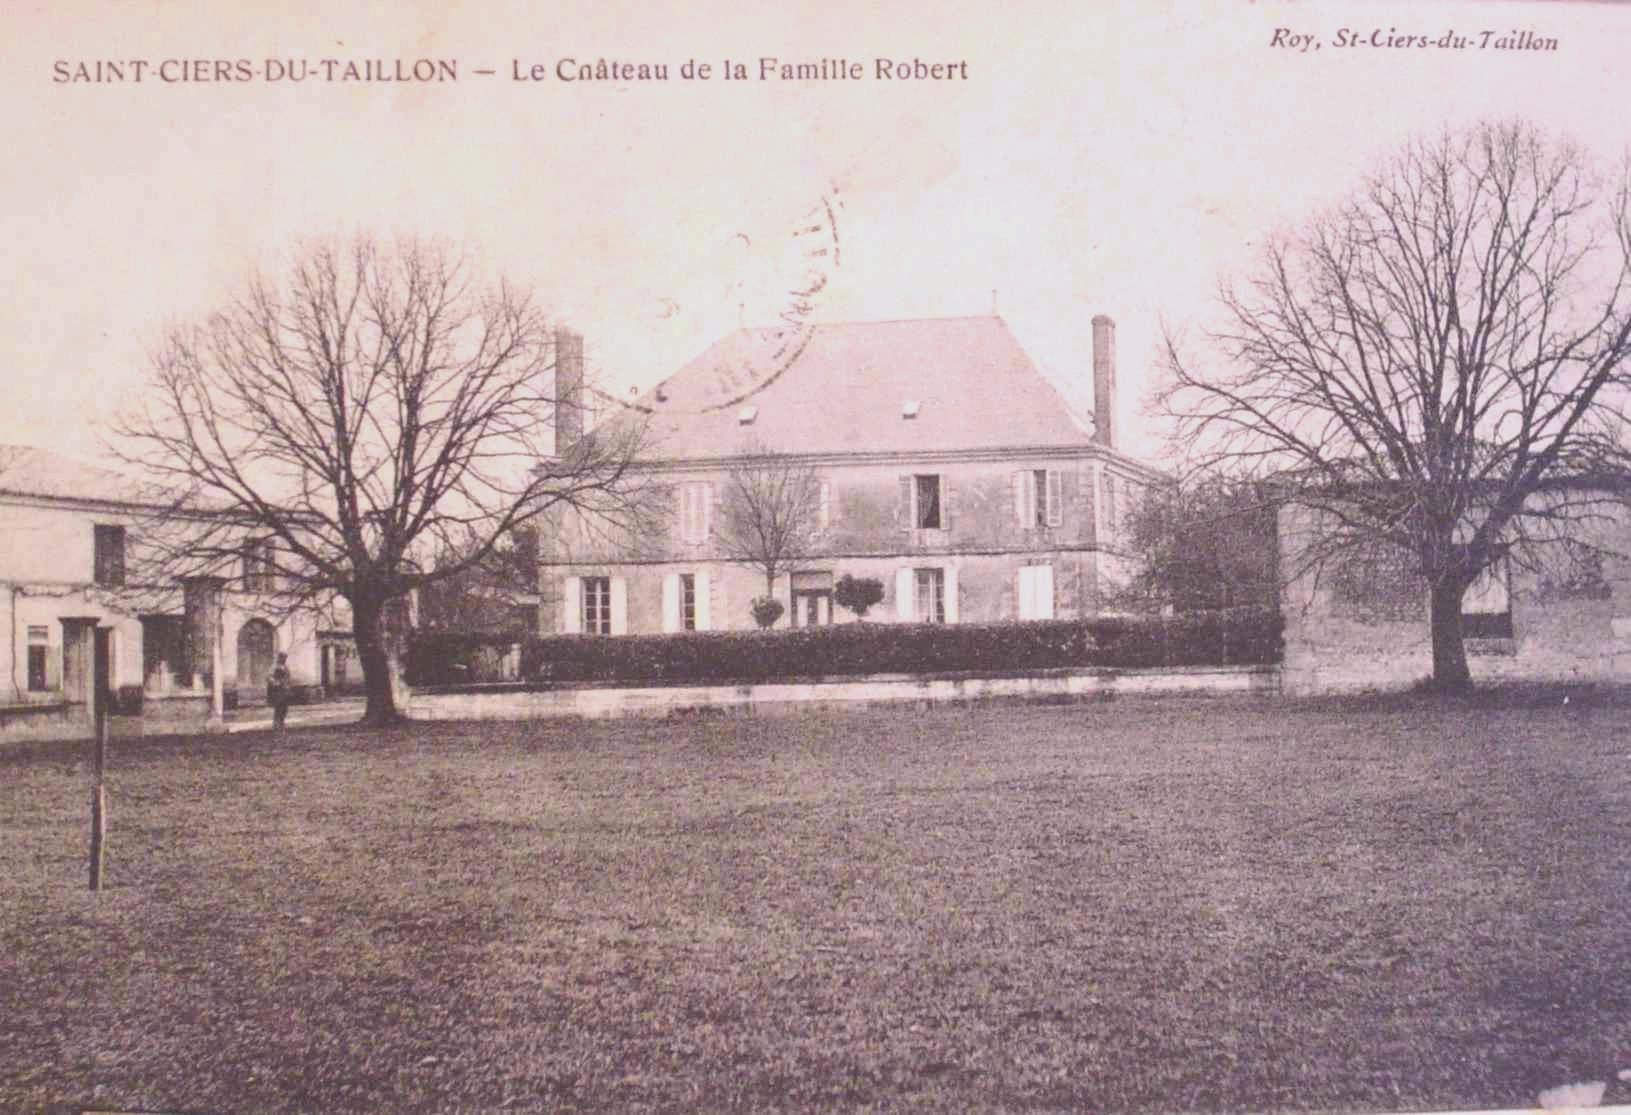 Chateaurobert